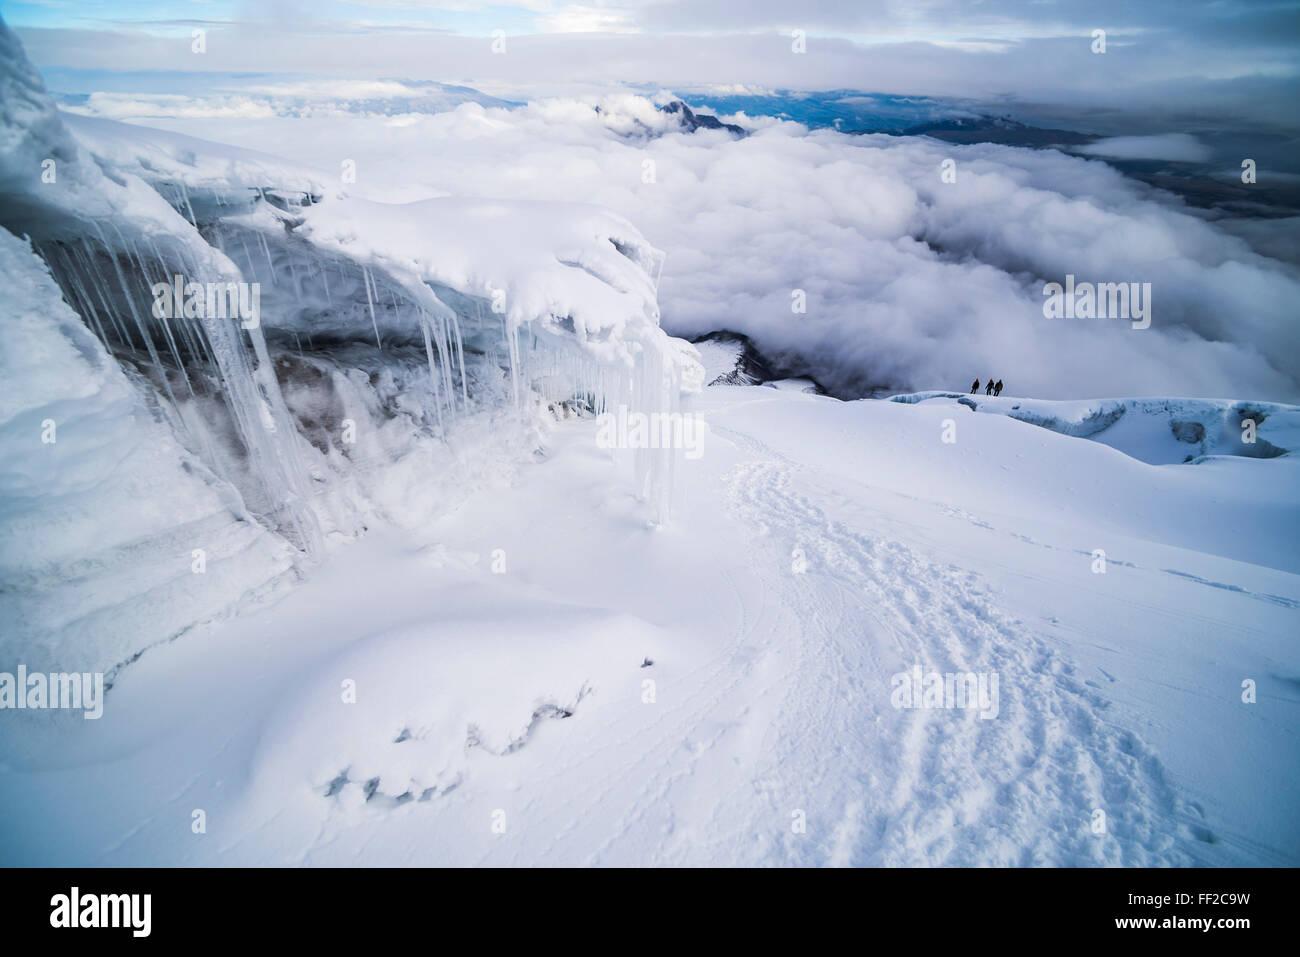 Eis-Formationen und IcicRMes auf VoRMcano Cotopaxi, Cotopaxi NationaRM Park, Provinz Cotopaxi in Ecuador, Südamerika Stockbild